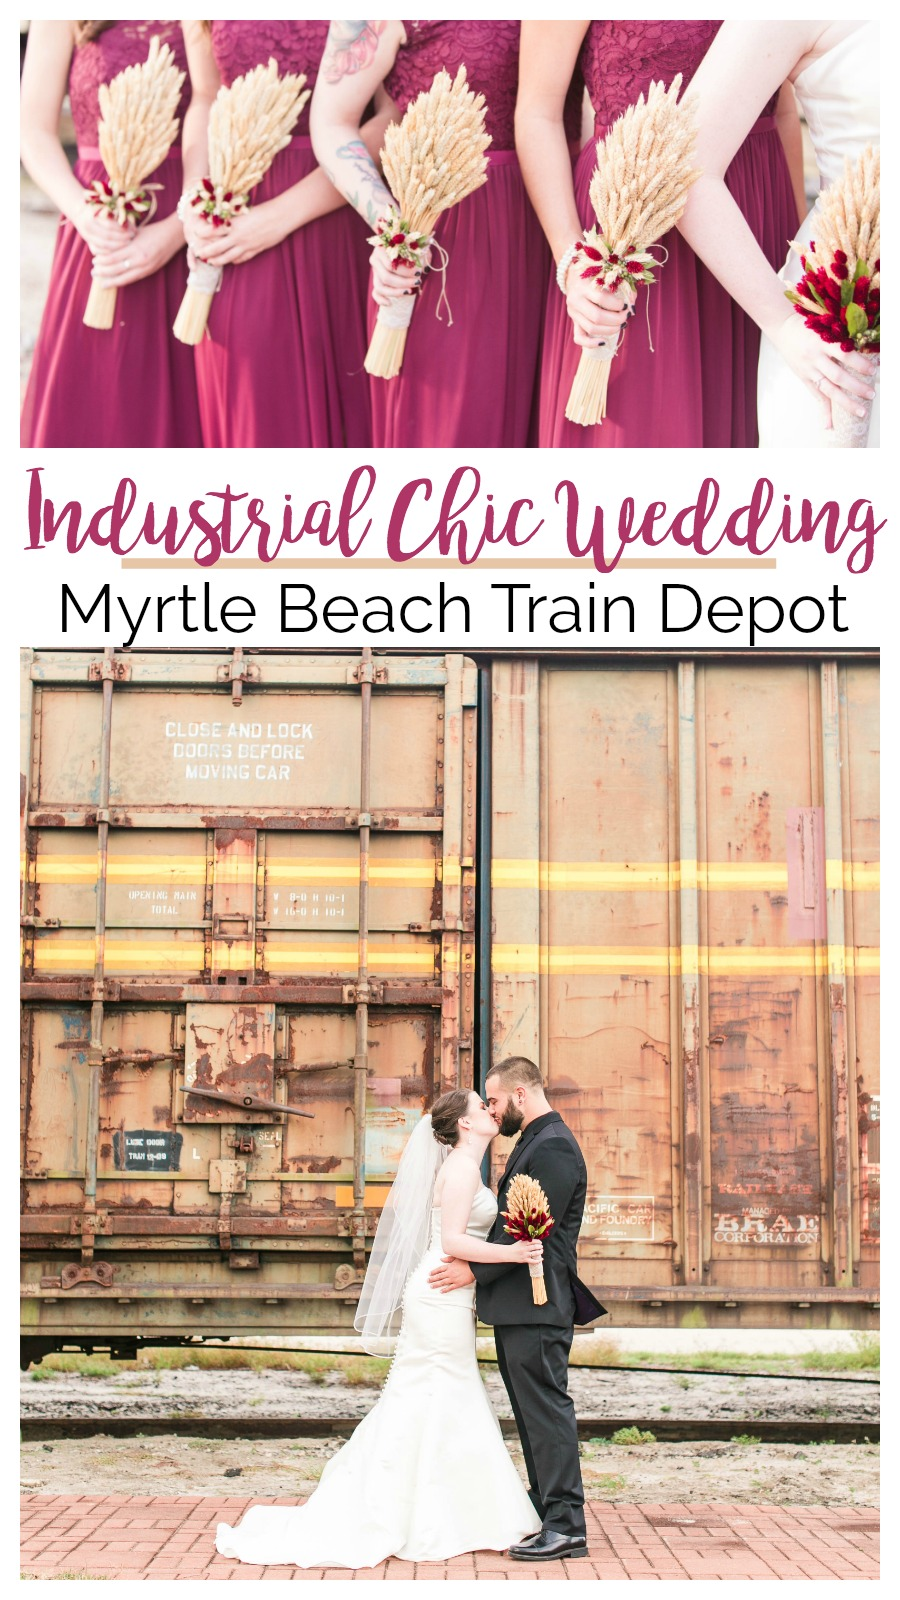 Darla + Phillip: Industrial Chic Wedding at the Myrtle Beach Train Depot | Palmetto State Weddings | Sweet E Photography | Burgundy wedding inspiration | historic wedding venue